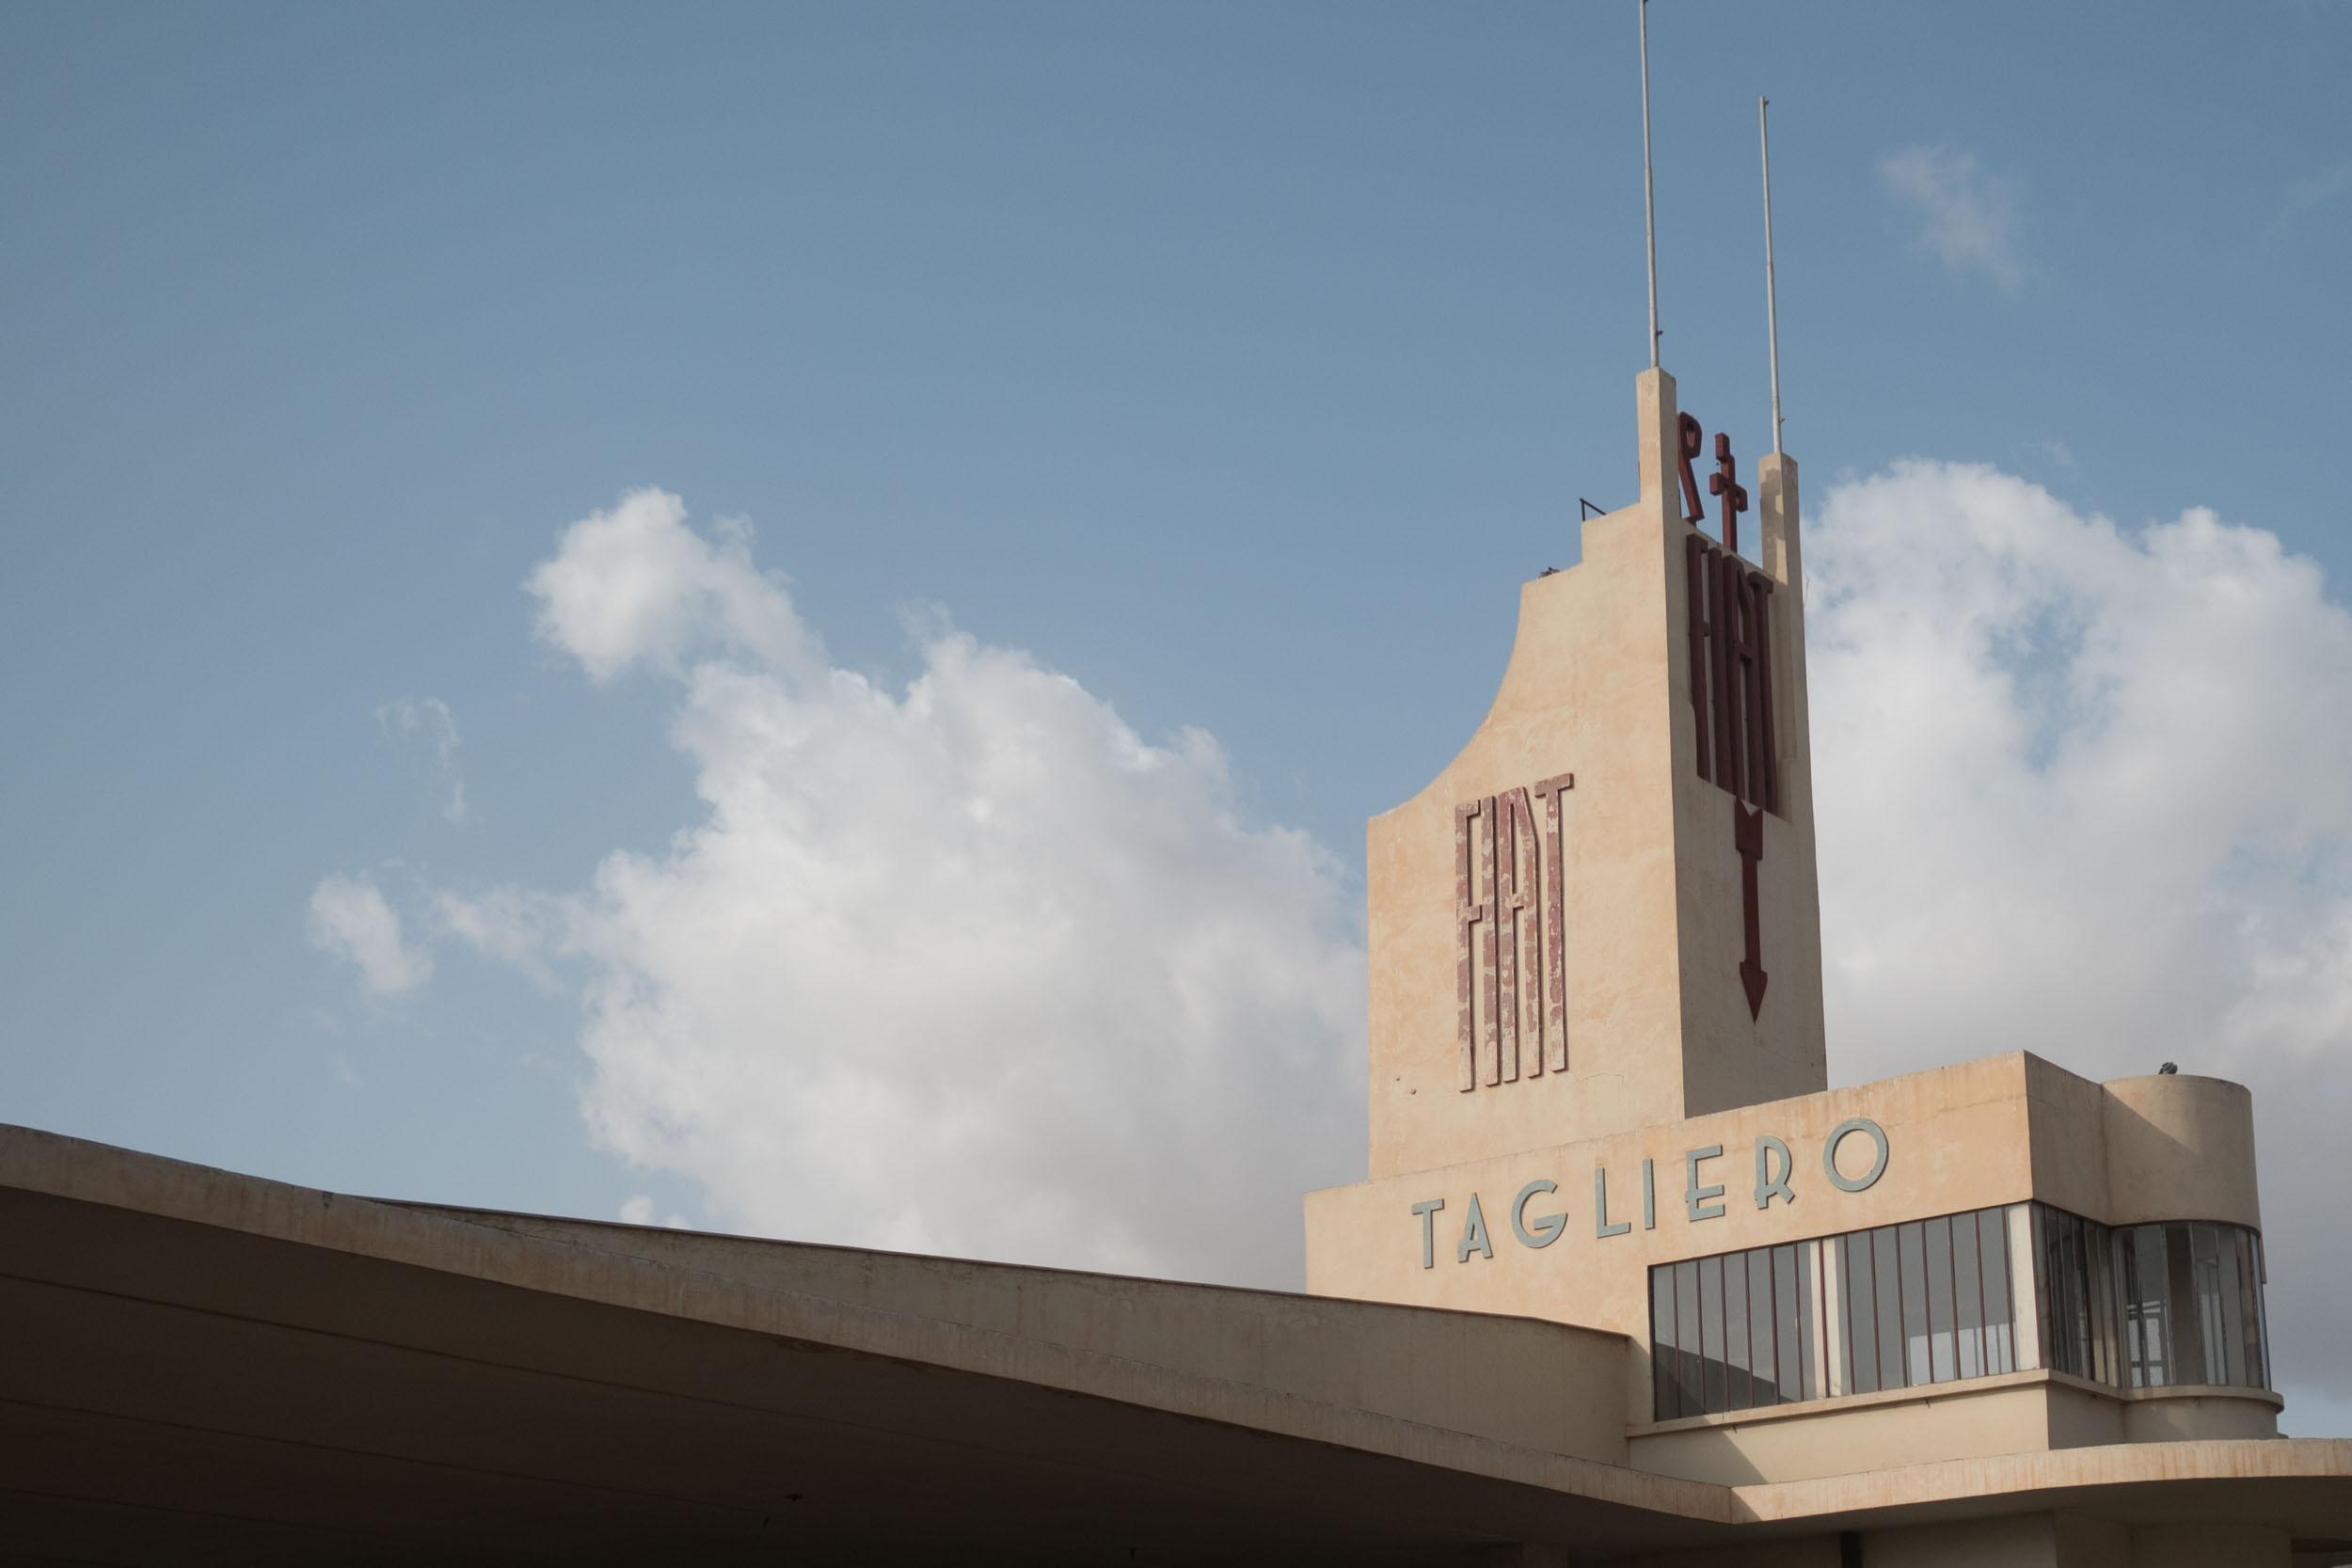 The Fiat Tagliero building in Asmara, Eritrea.